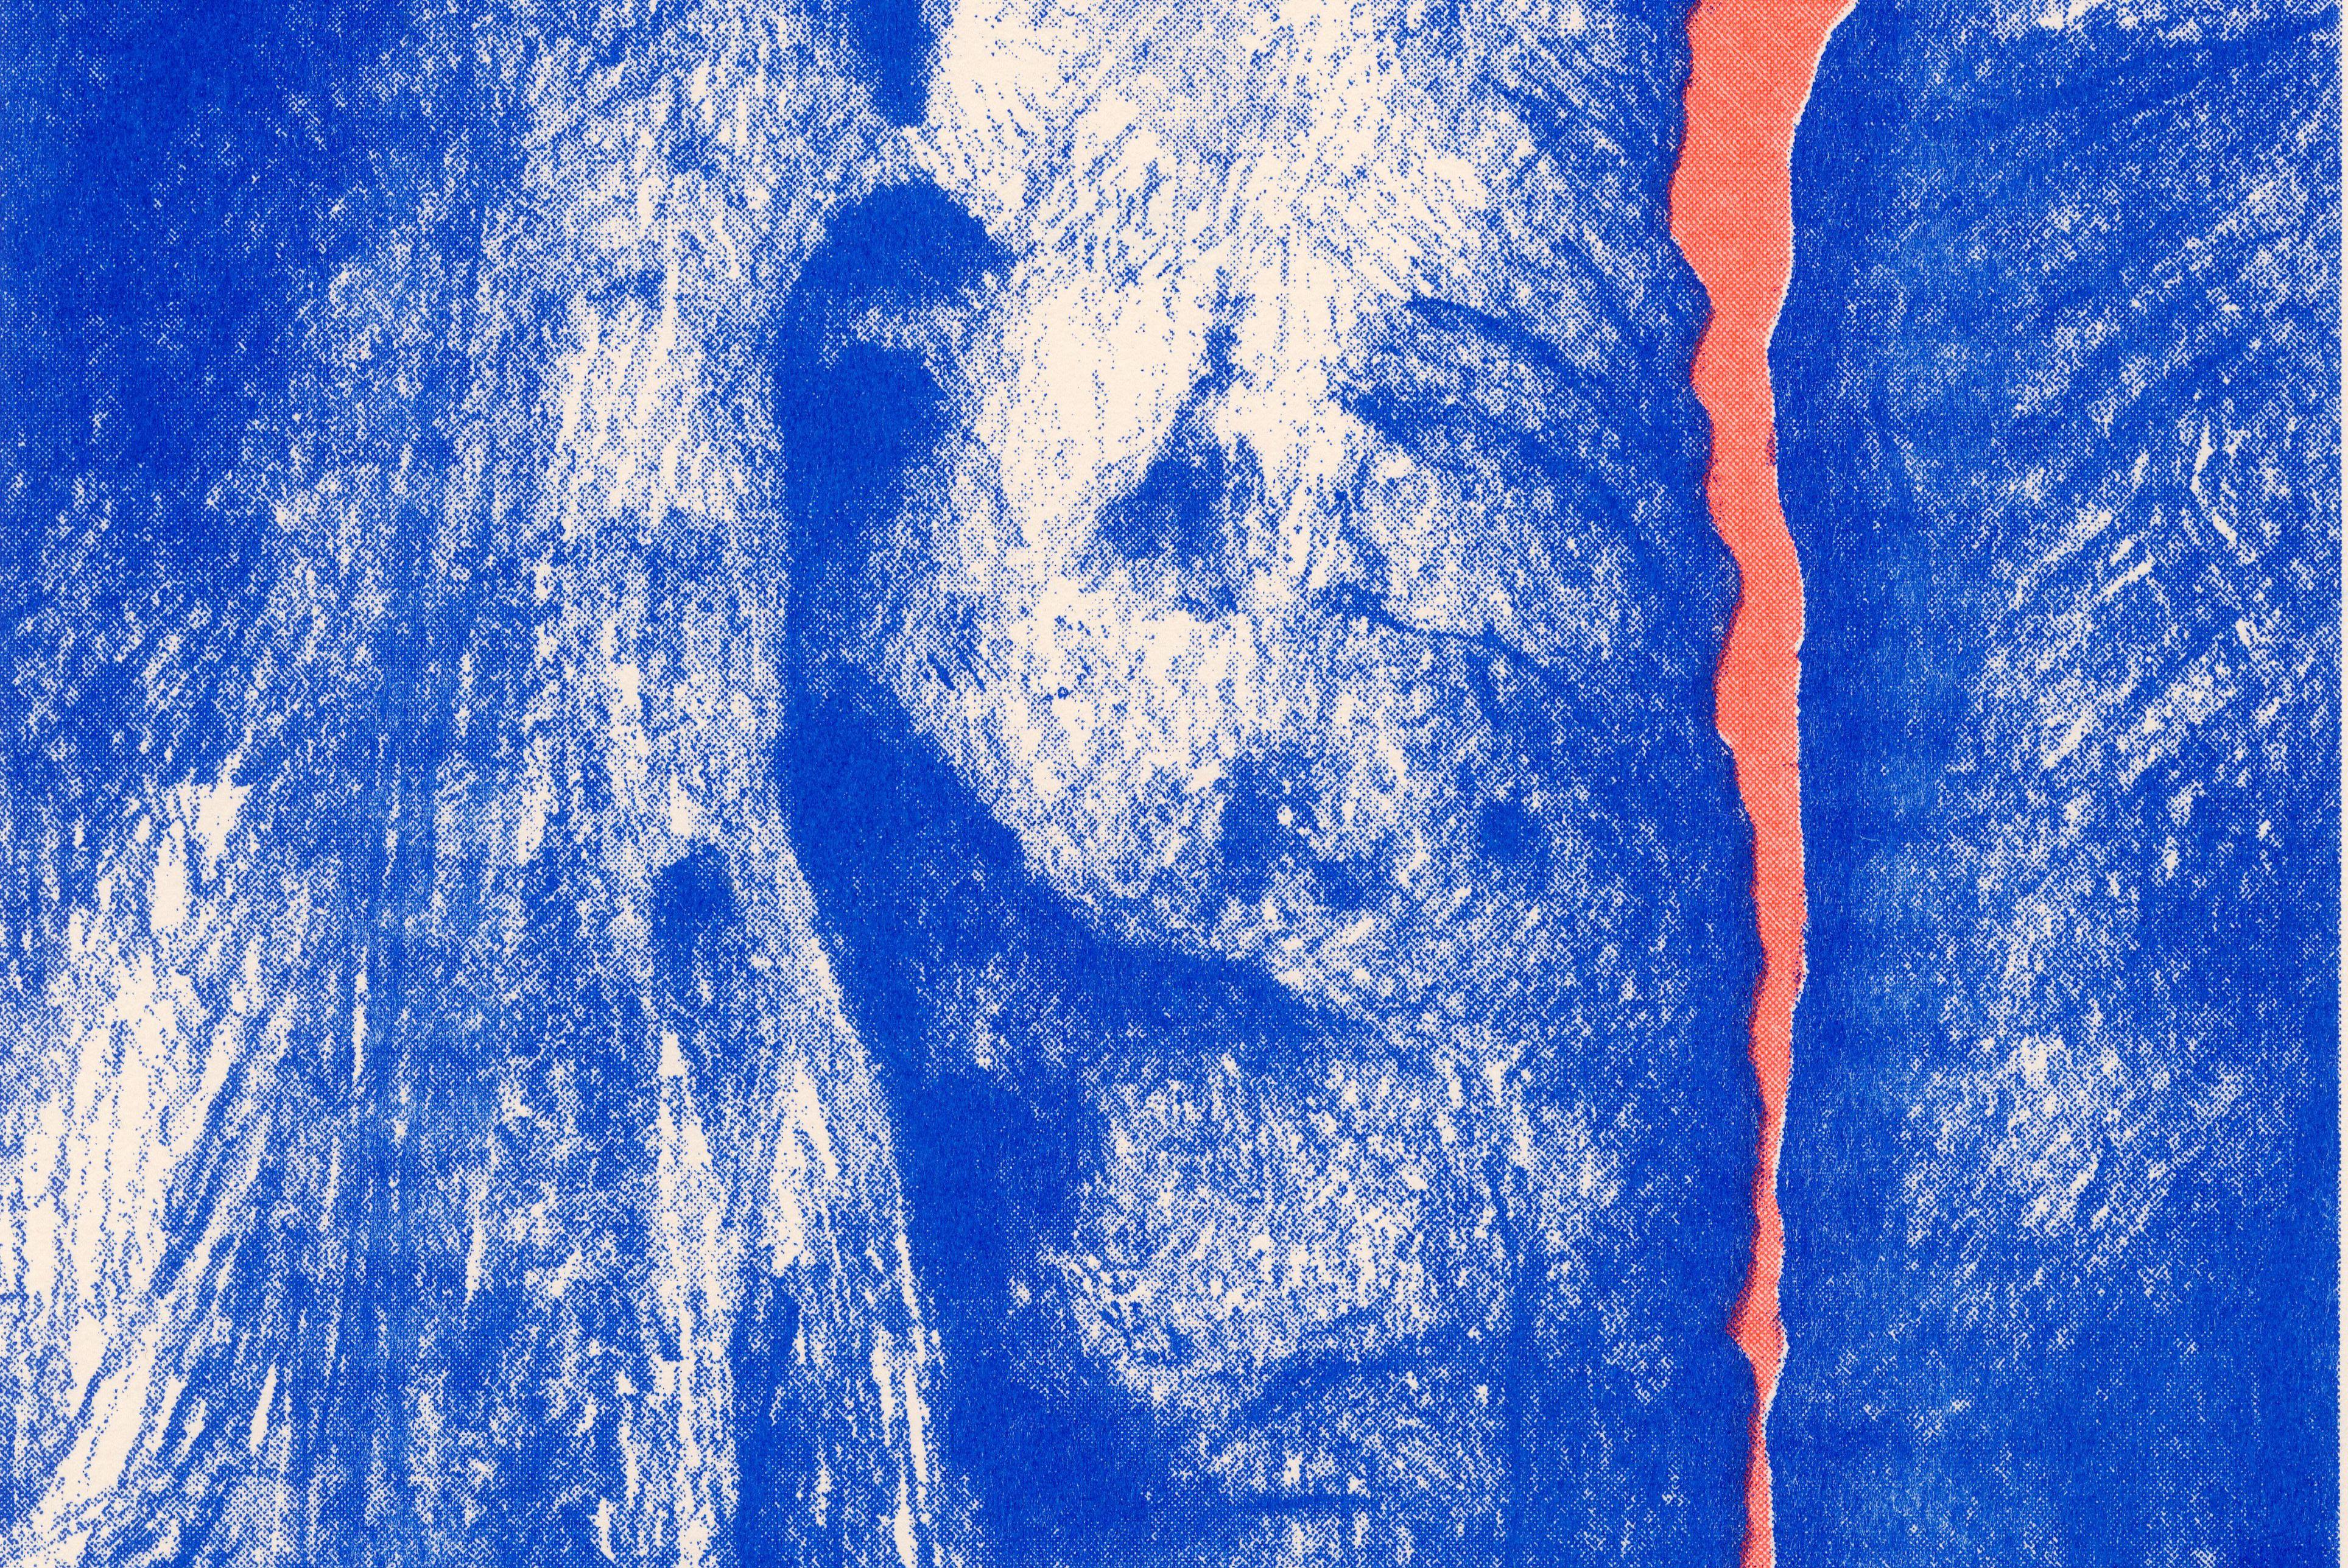 stones, risograph, blue, orange, illustration